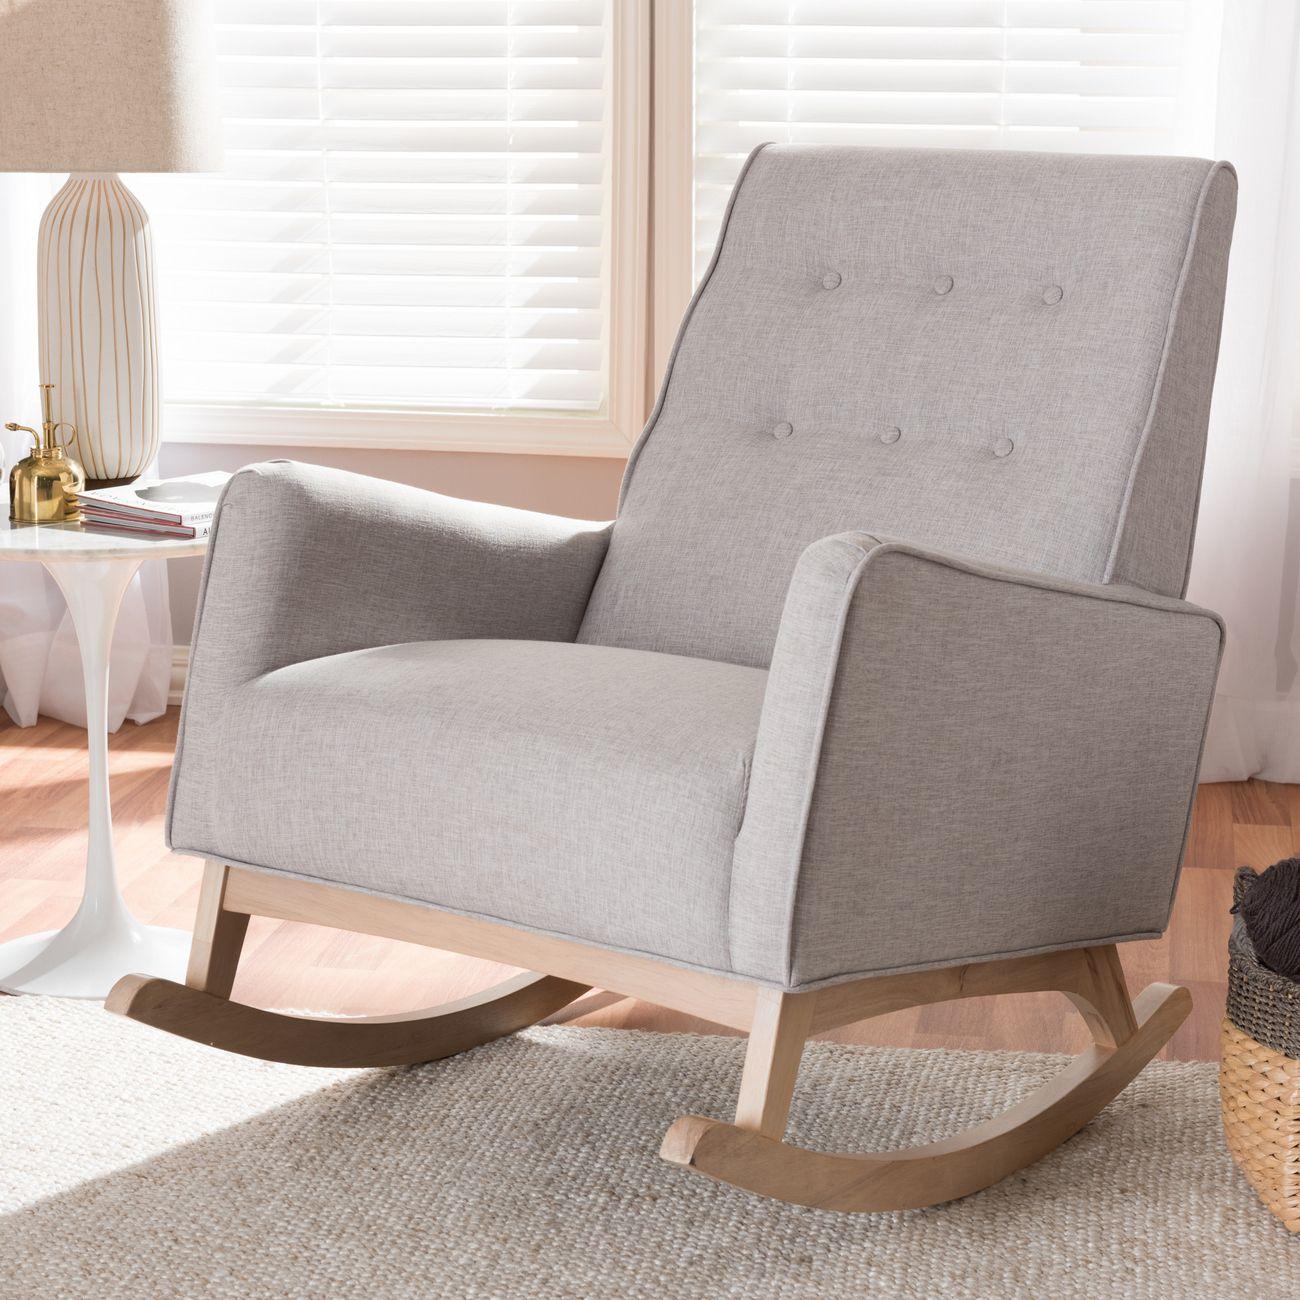 Baxton Studio Marlena Mid Century Modern Greyish Beige Fabric Upholstered Whitewash Wood Rocking Chair Bbt5308 Greyish Beige Rc